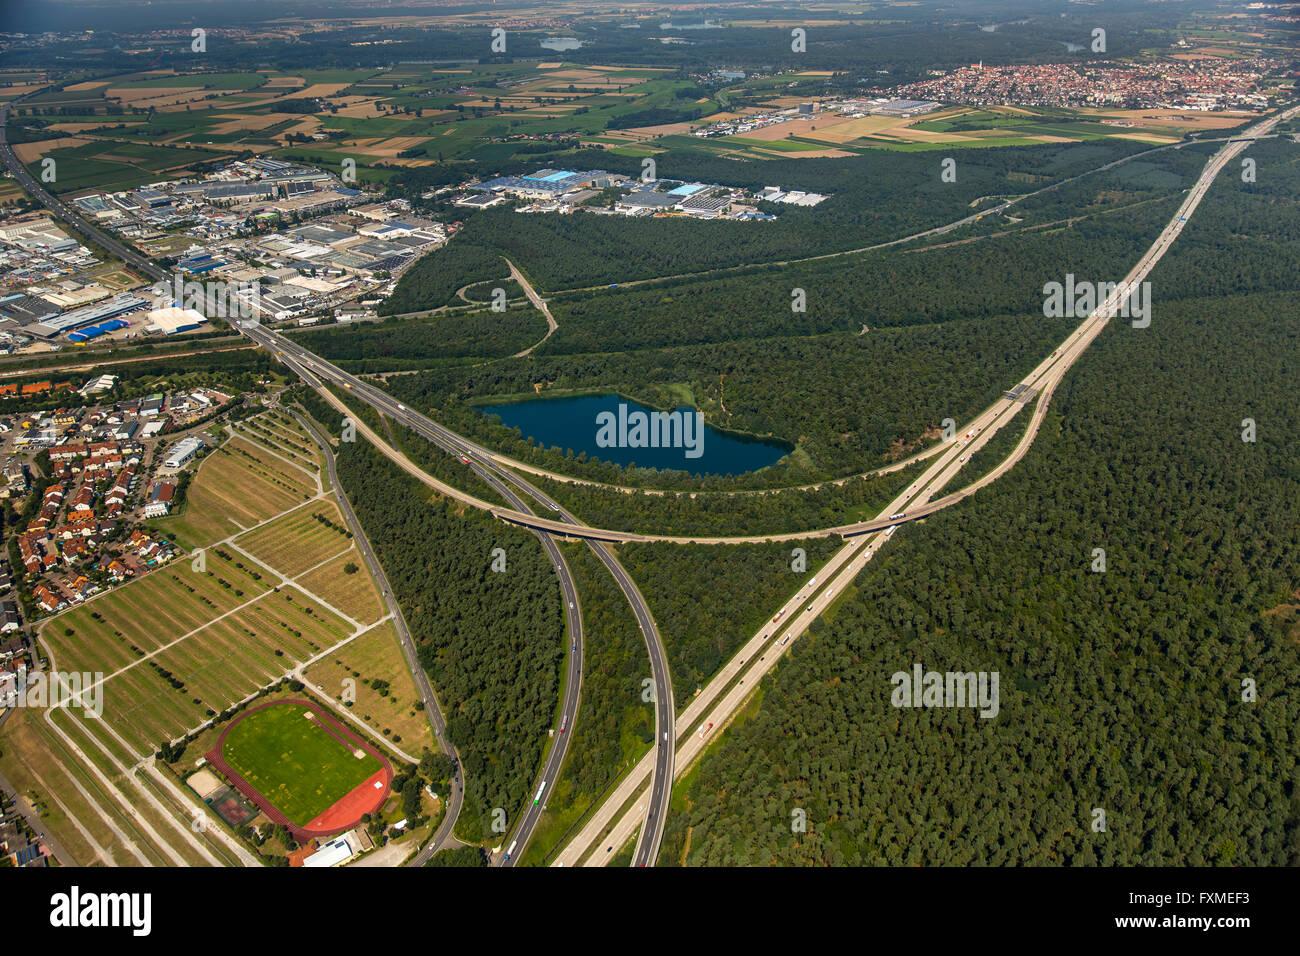 Aerial view, Hockenheimring, formerly Hockenheimring, Kurpfalzring, Motor Racing, DTM track, Germany, Europe, Aerial Stock Photo